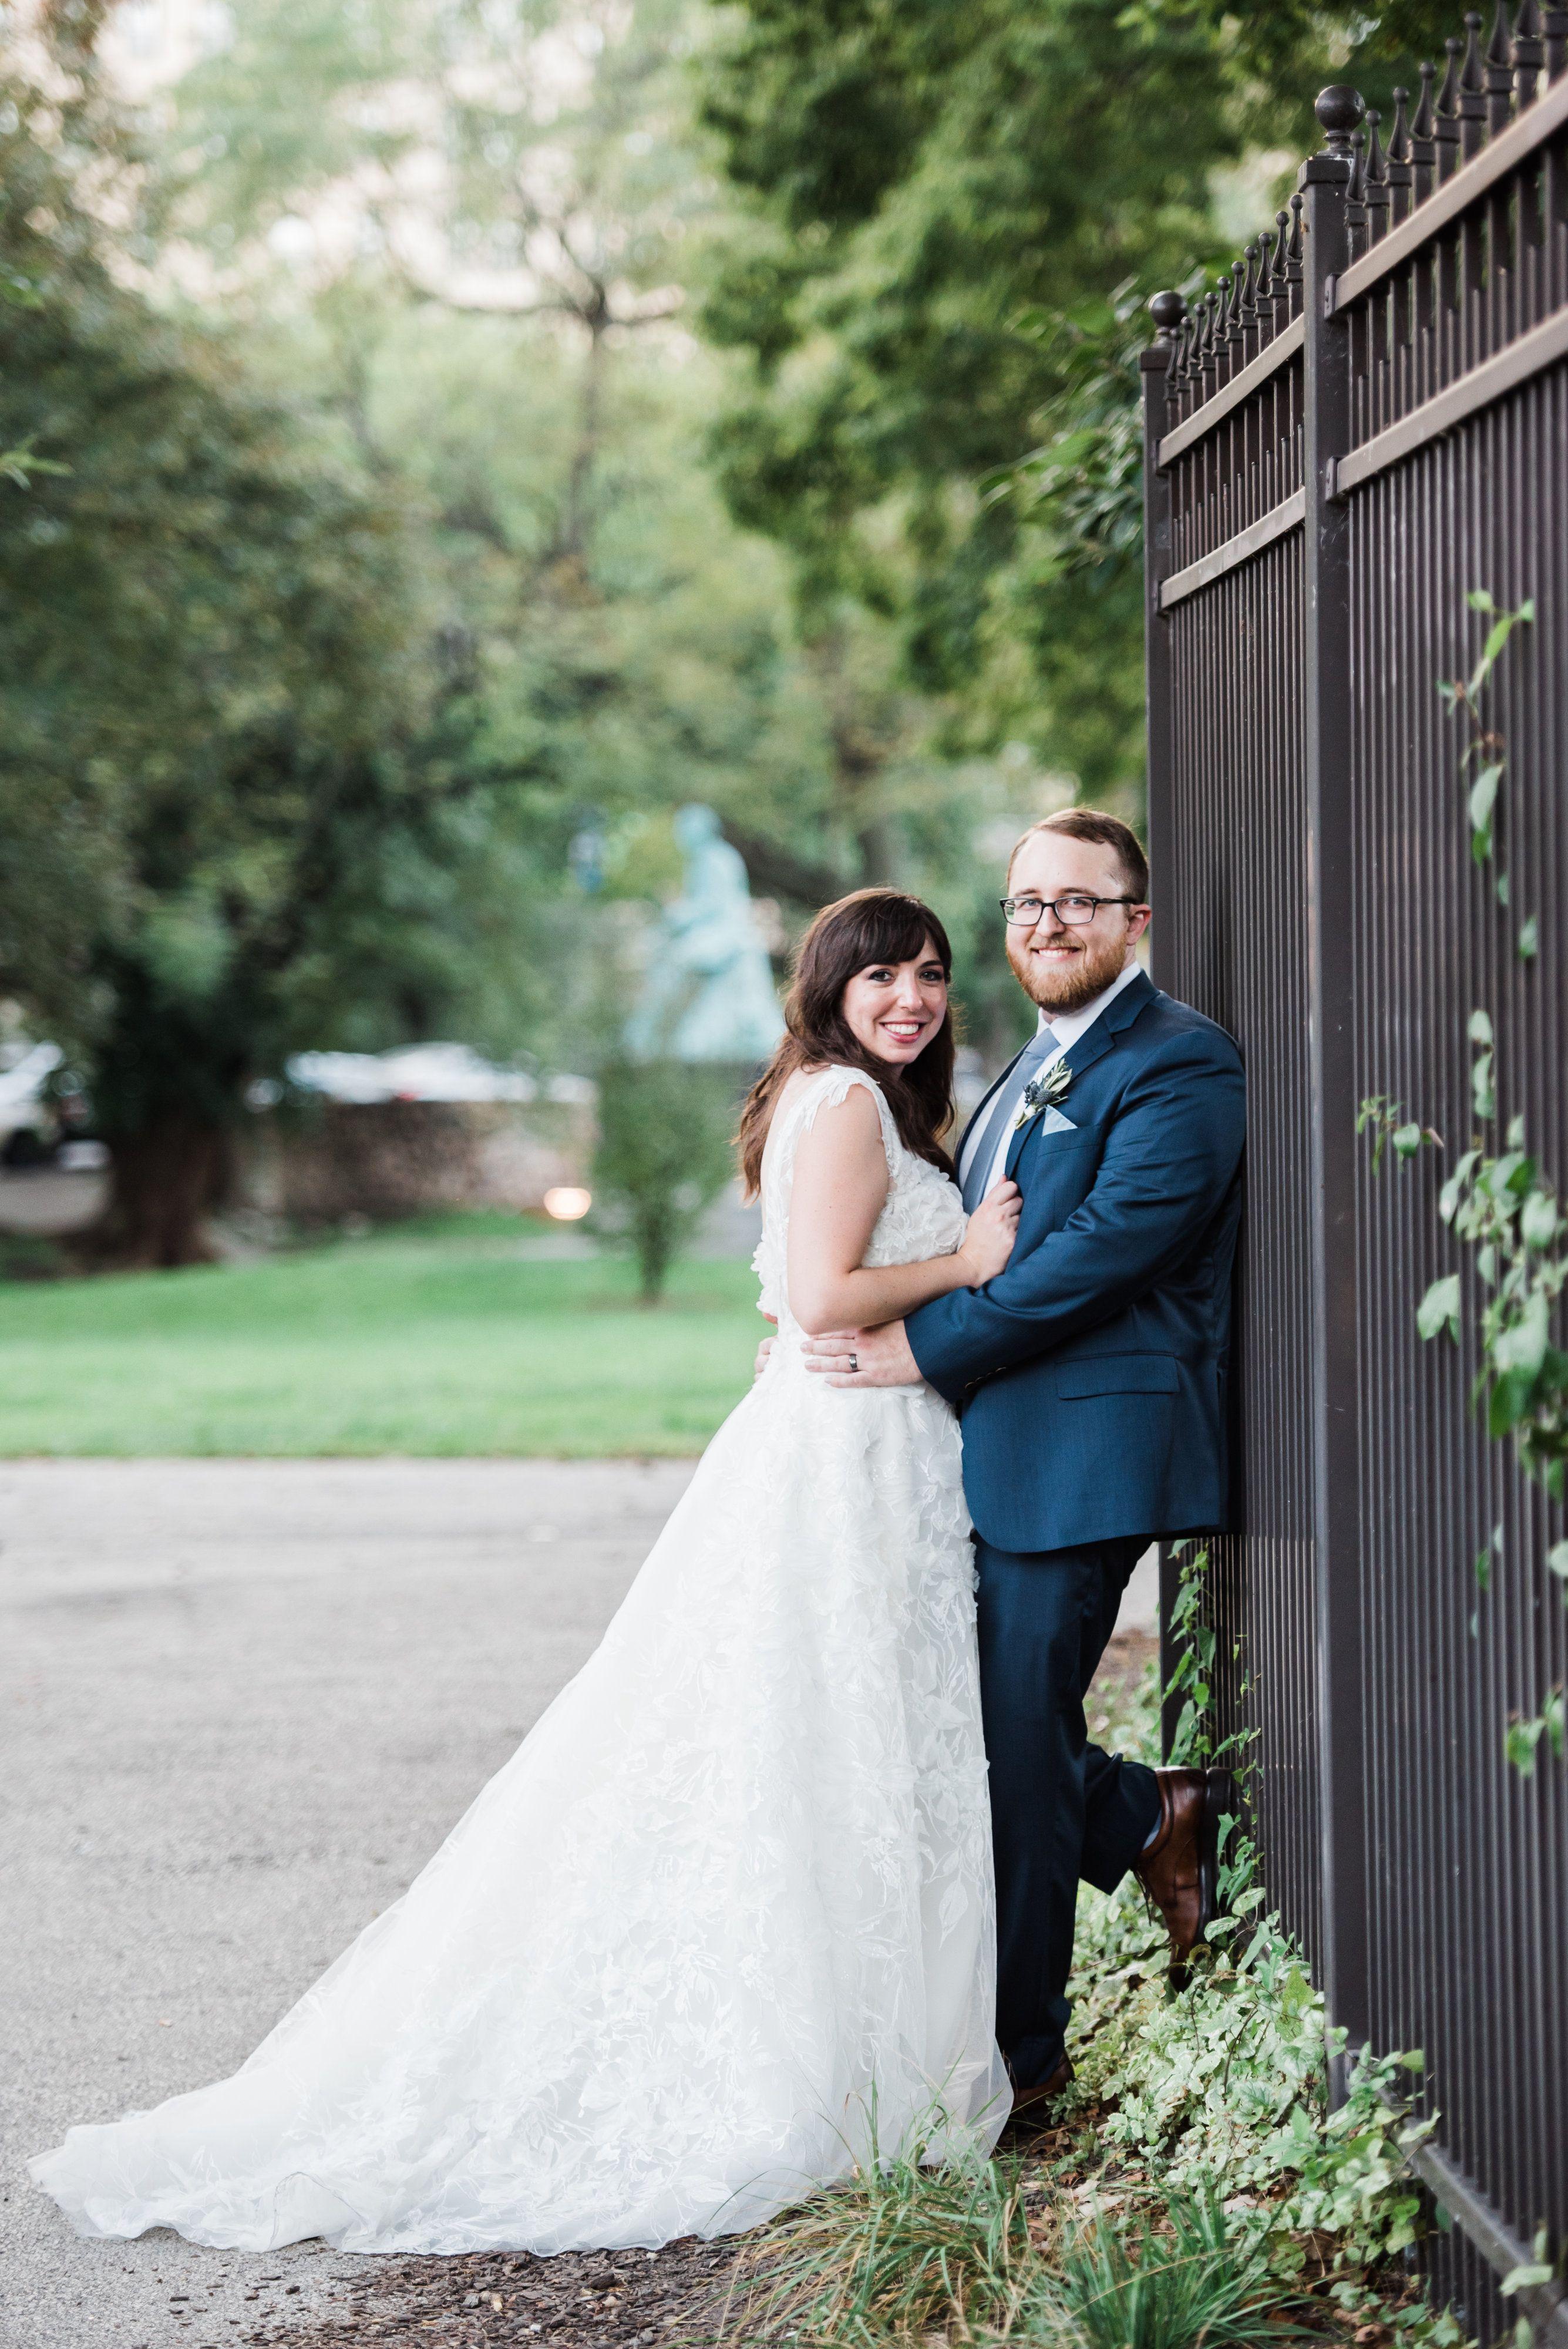 Cafe Brauer Chicago Wedding Wedding Photography Poses Wedding